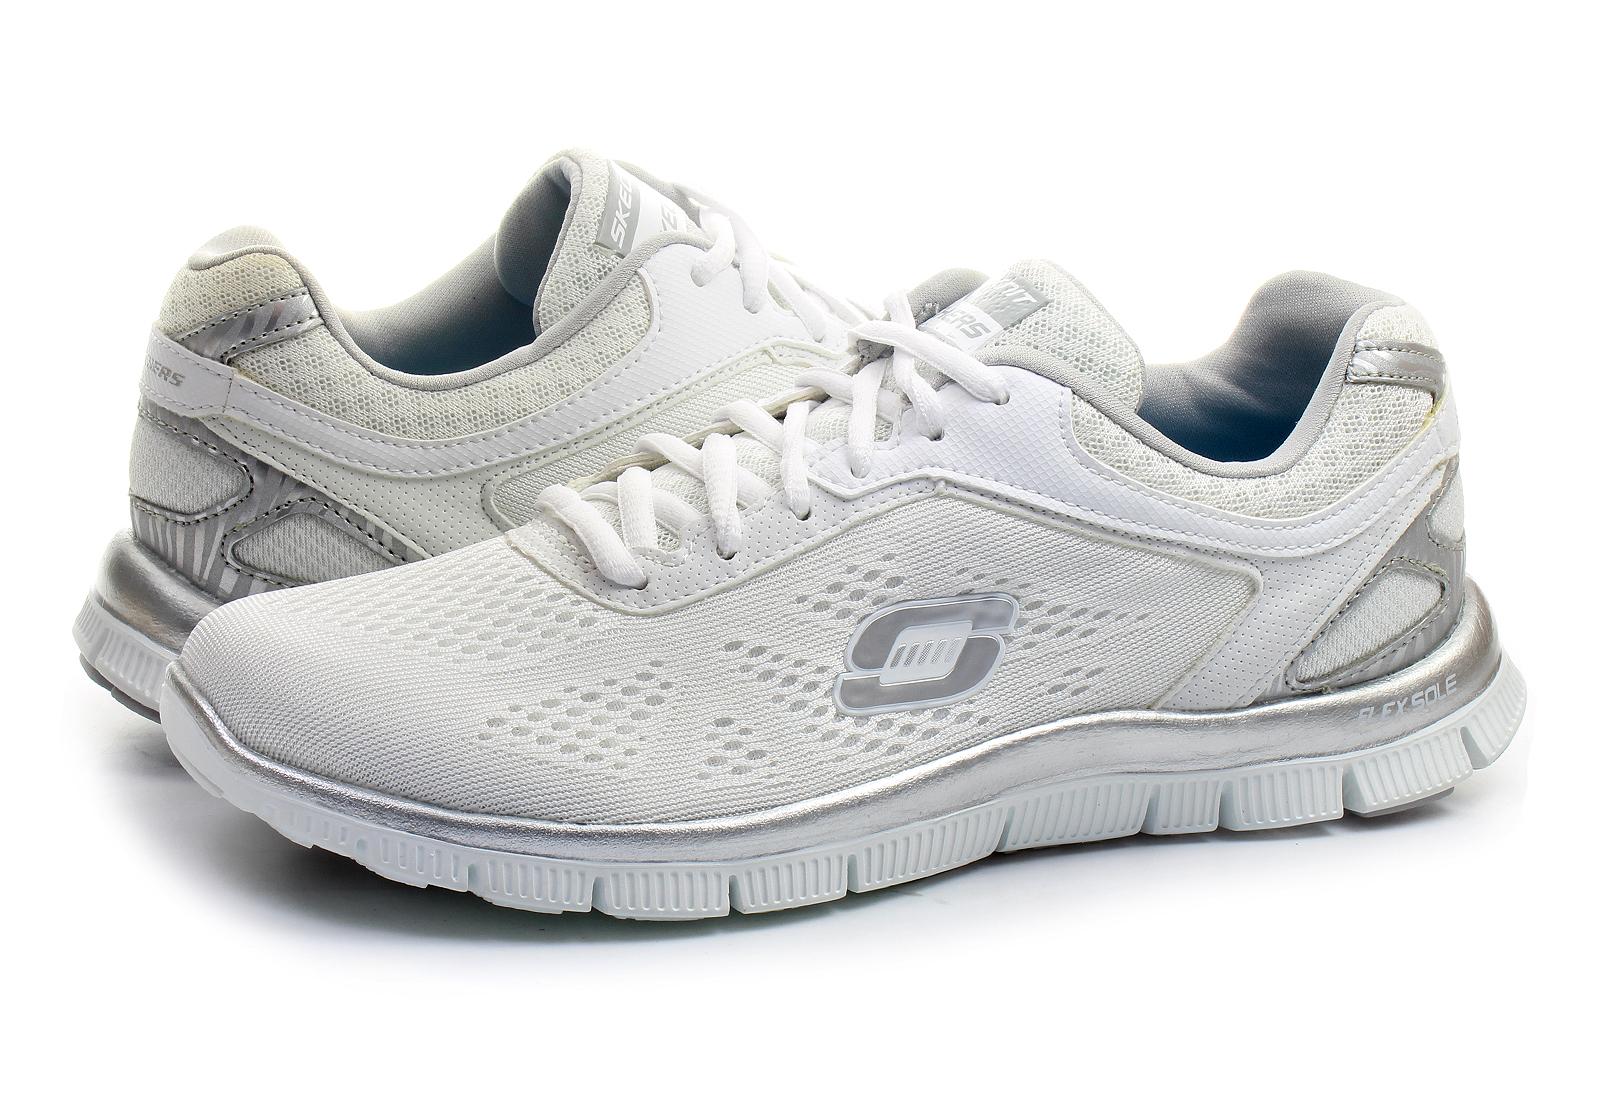 Skechers Cipő - Love Your Style - 11728-wsl - Office Shoes Magyarország 7388f5fd47